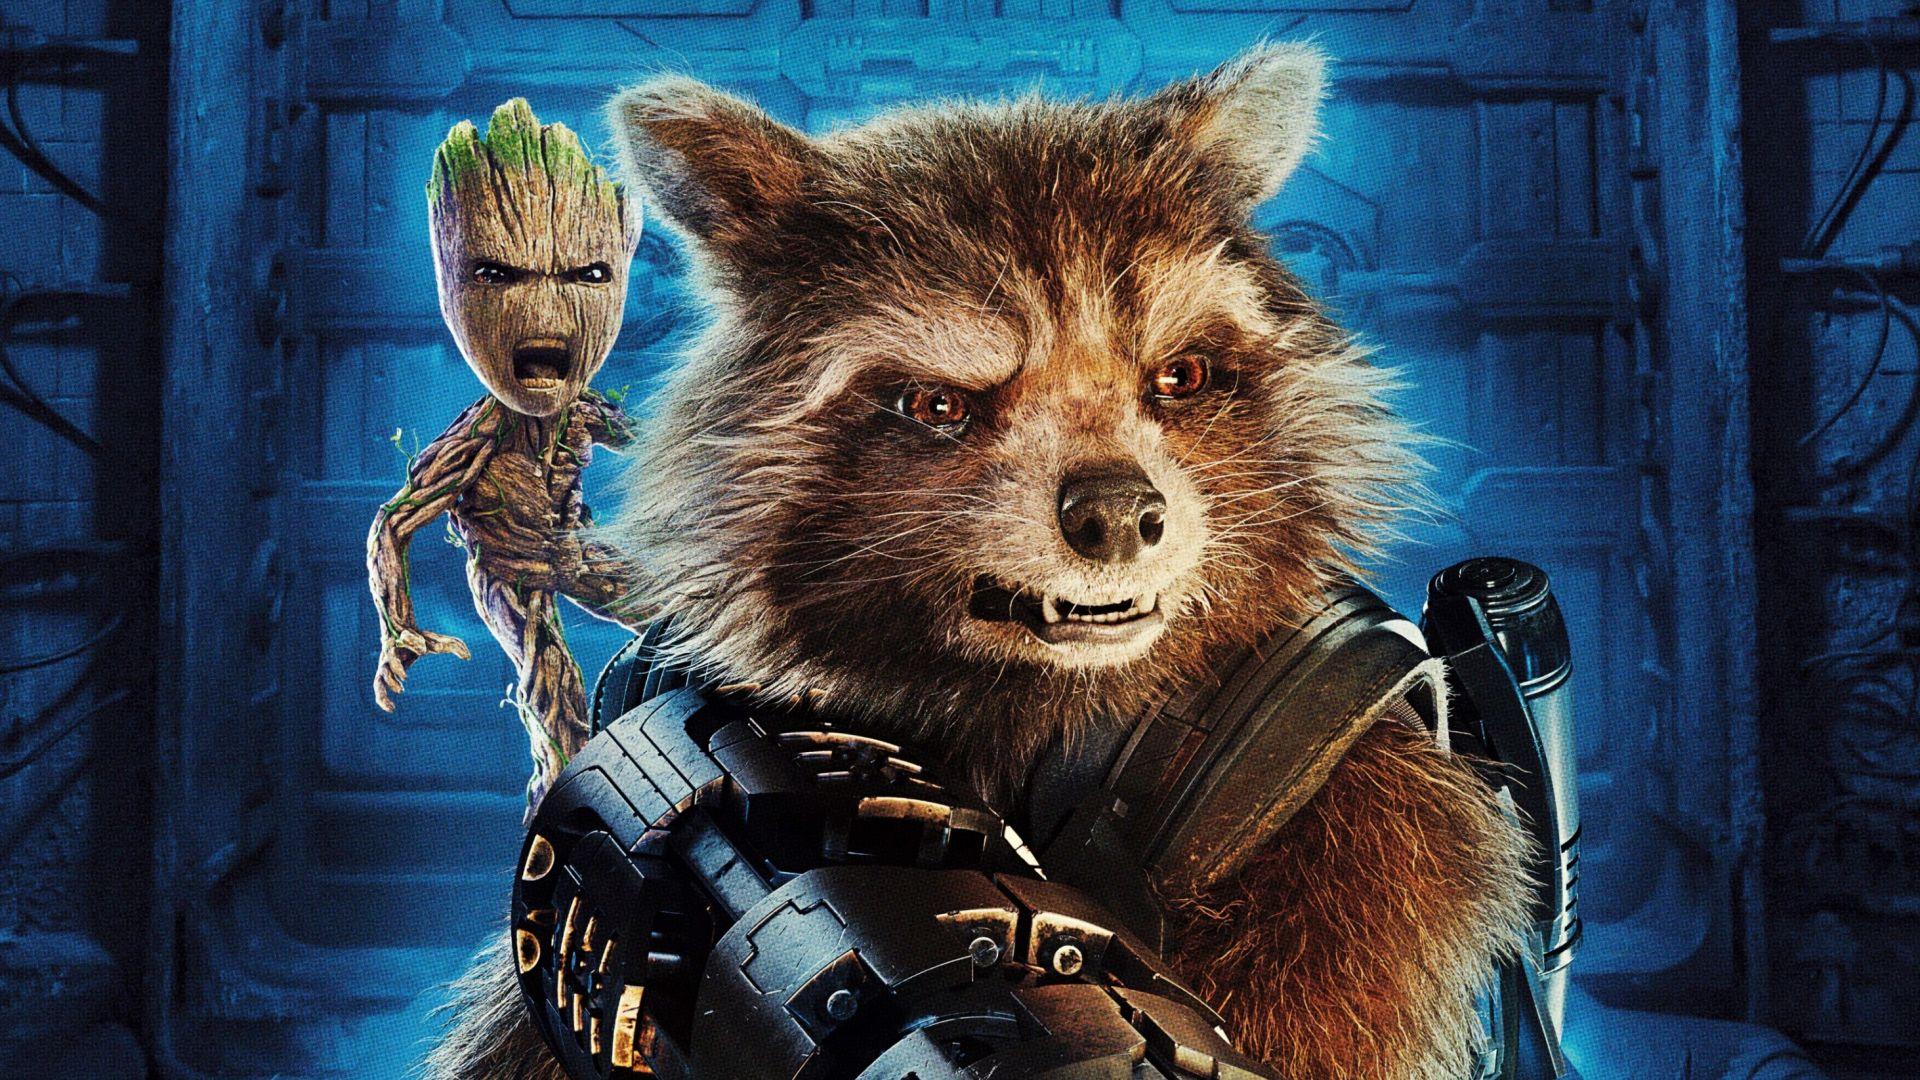 Desktop Wallpaper Baby Groot Guardians Of The Galaxy Vol 2 Movie